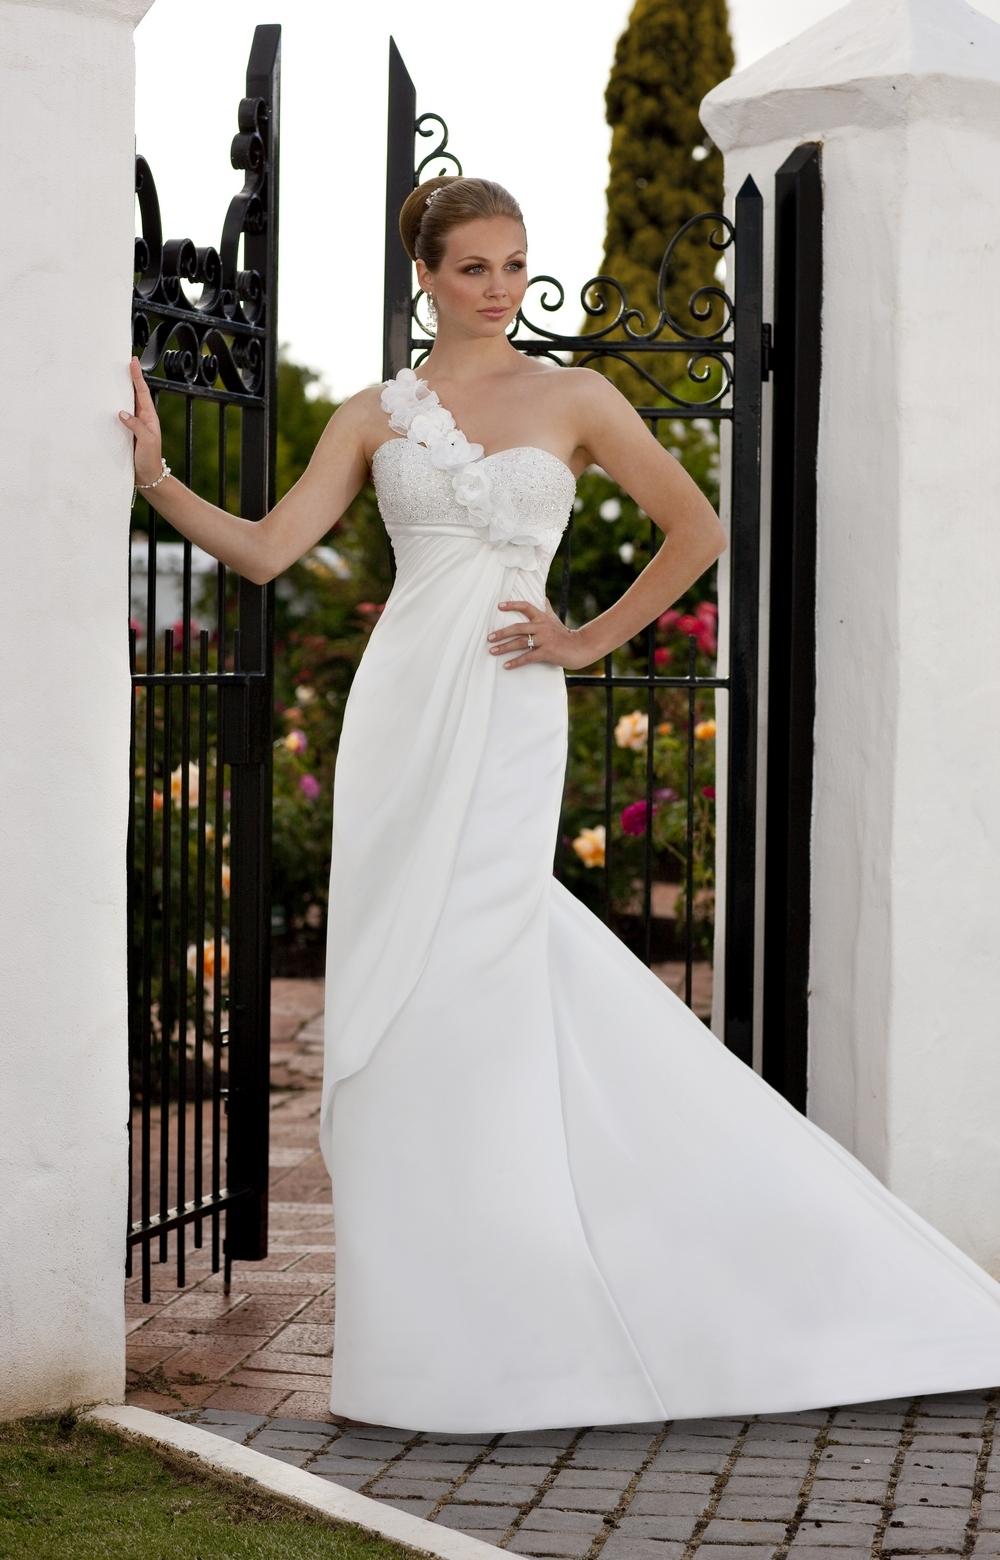 Essense-of-australia-wedding-dresses-2010-2011-d1080-assymetric-strap.full